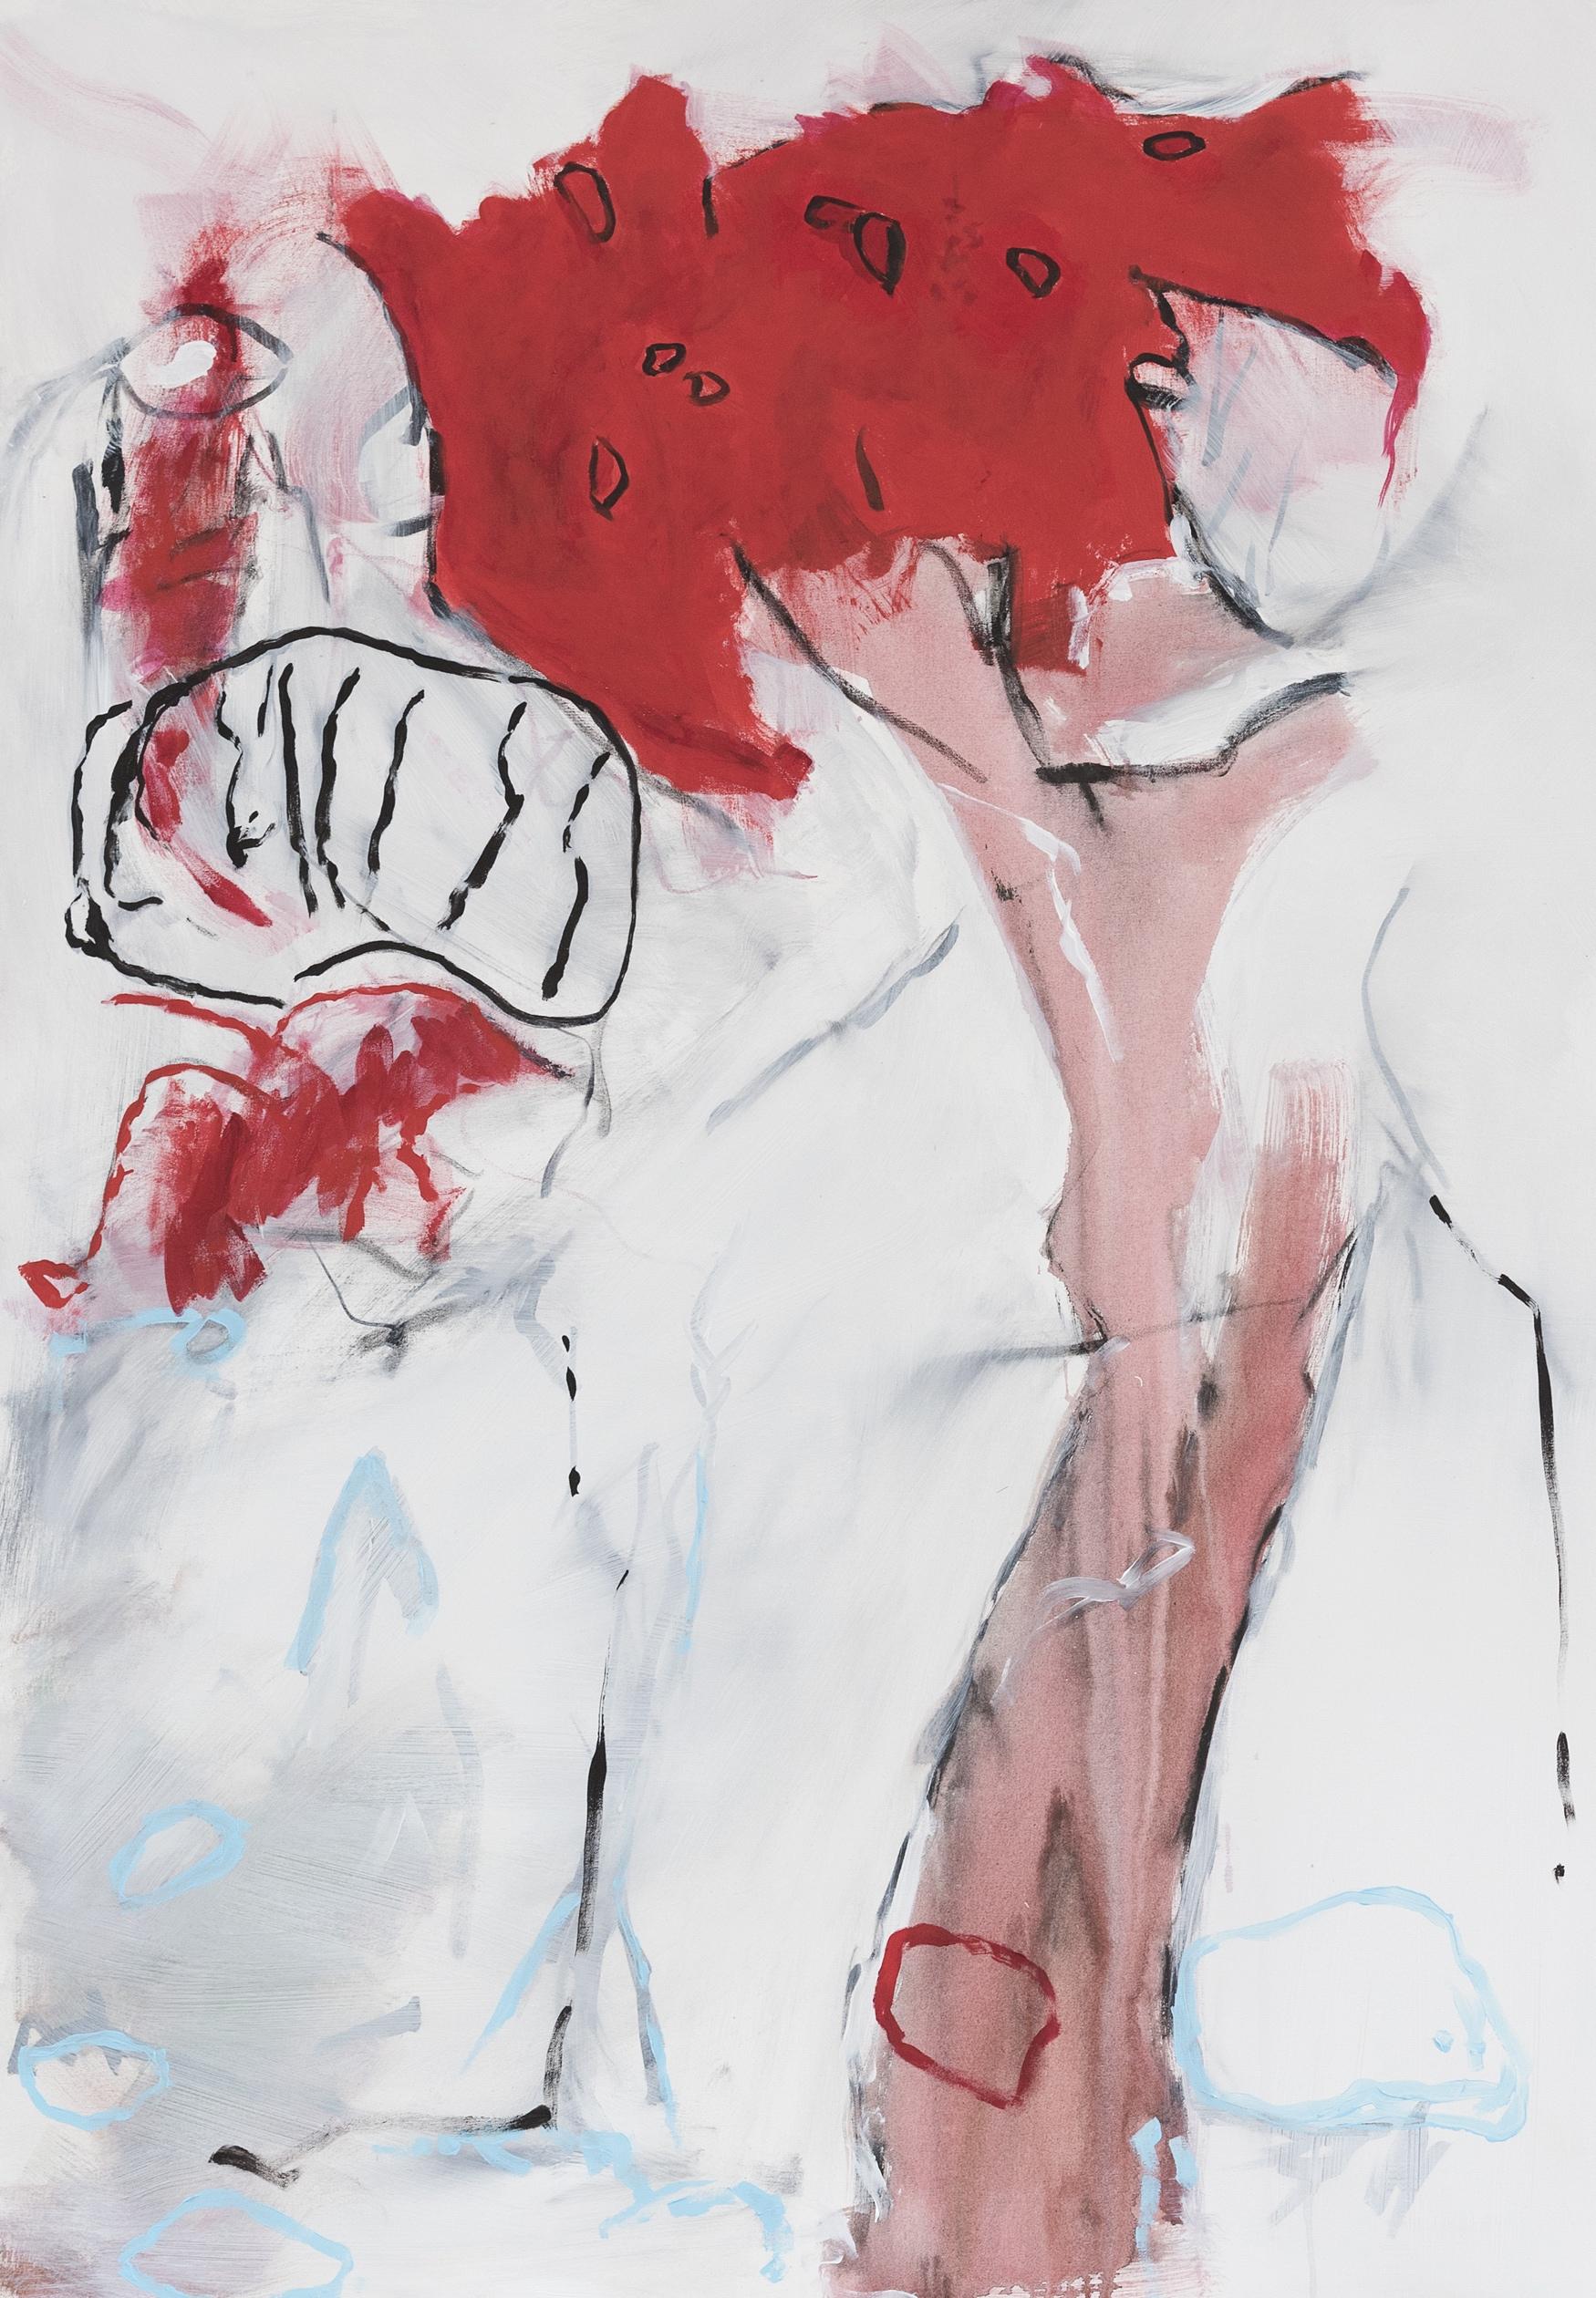 Rainer Gröschl, 2018, DK, Acryl auf Leinwand 2018, 140 x 100 cm